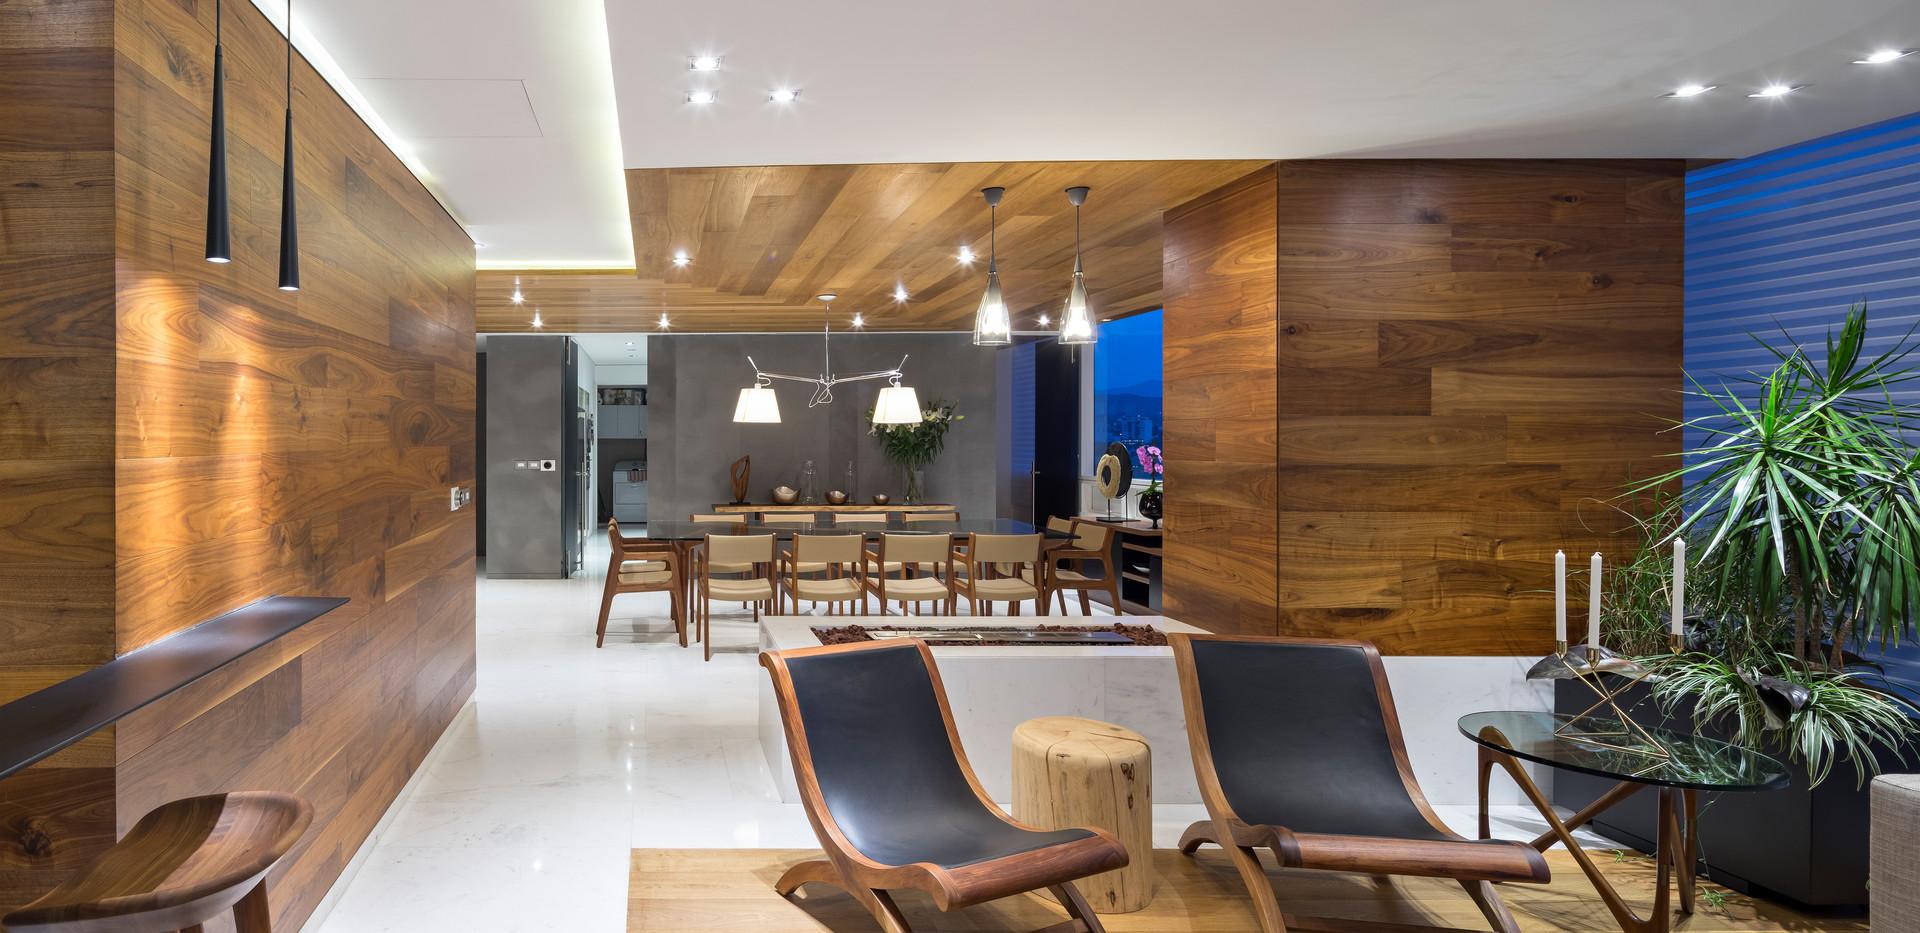 Vidalta Apartment / ASHO Mexico City, Mx